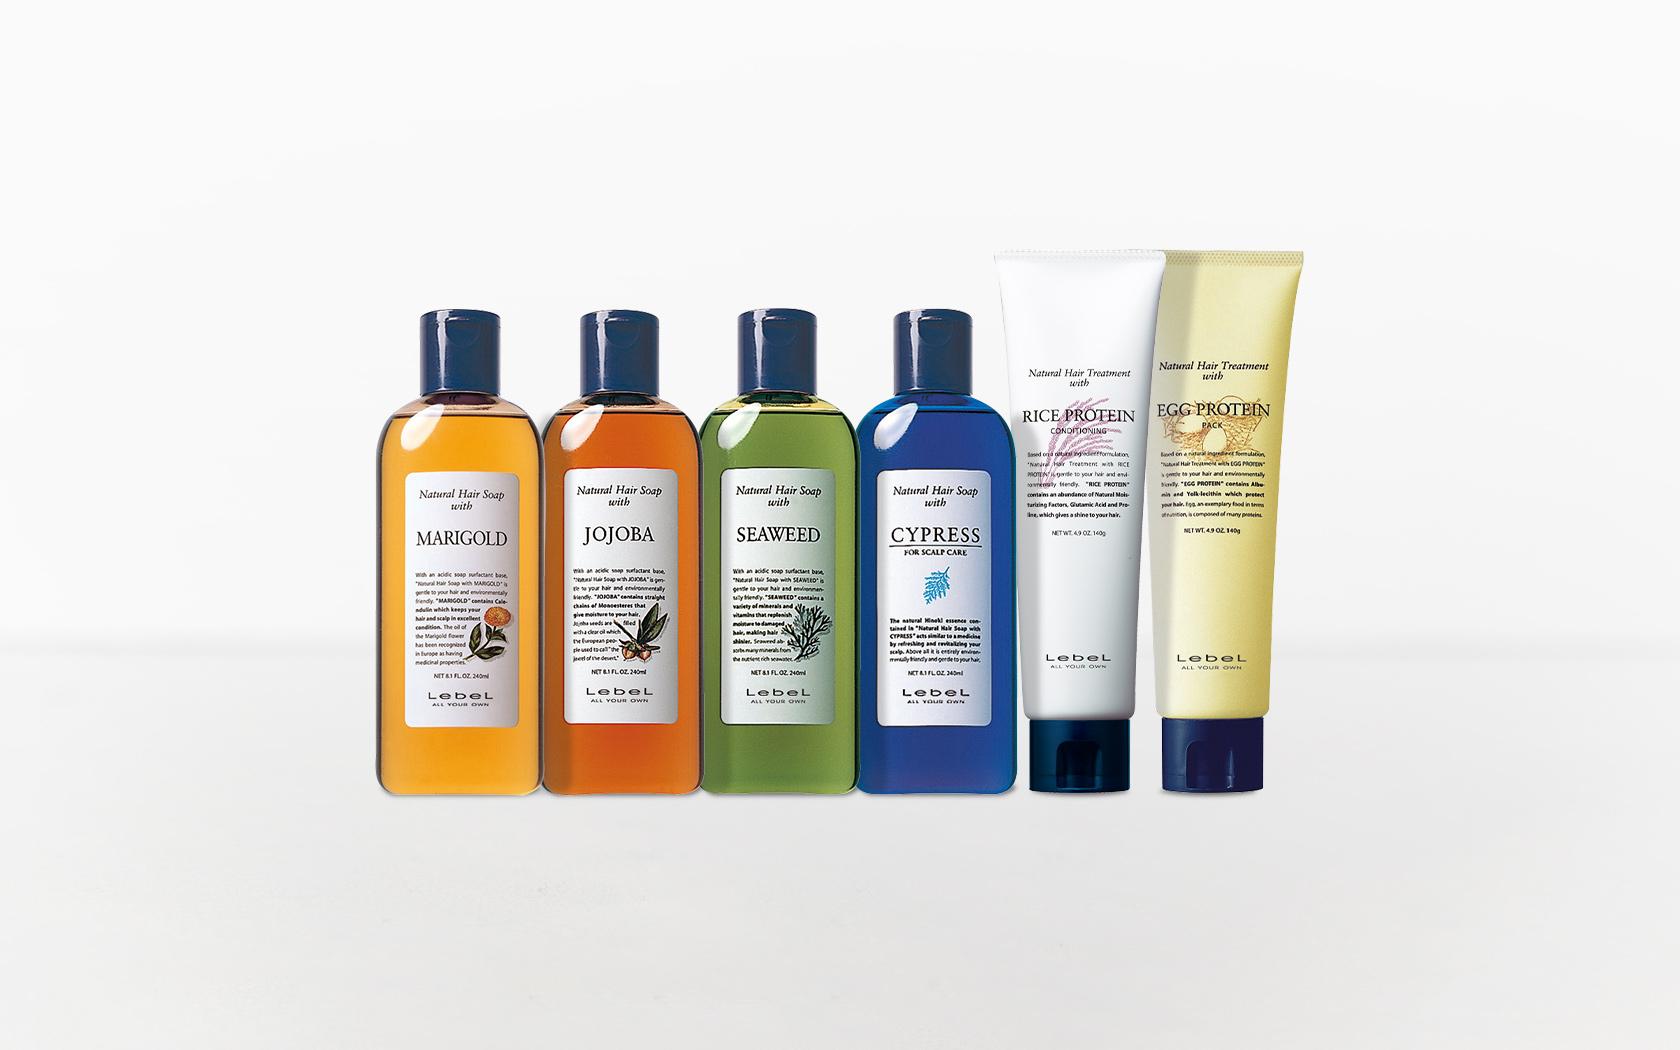 Natural Hair Soap & Treatment